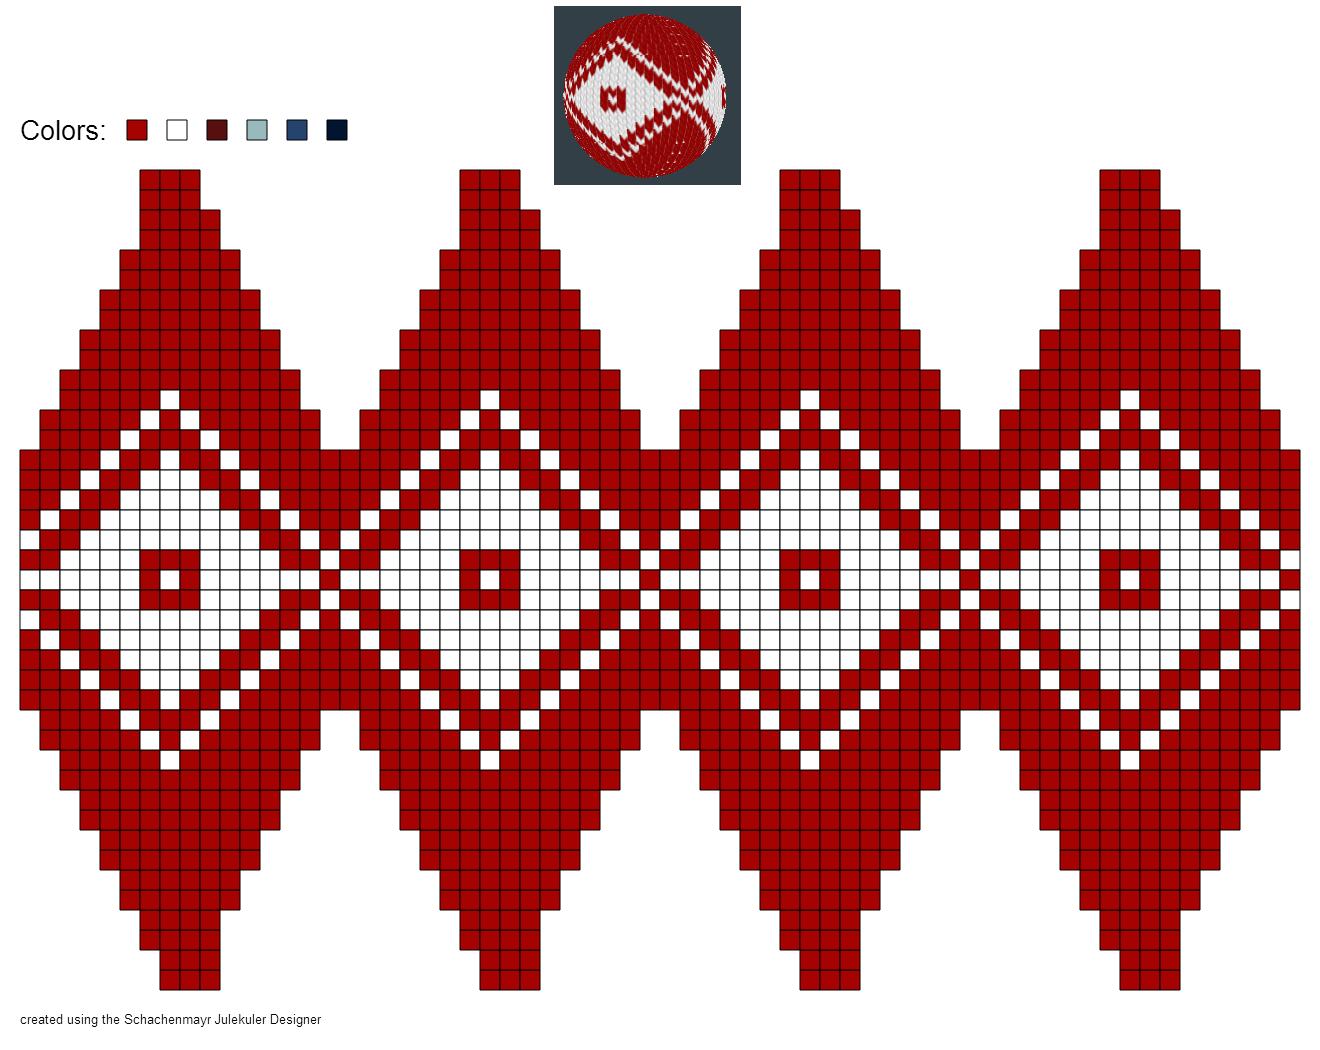 FREE Beaded Bead Pattern ___ created using Schachenmayr #Julekuler Designer #christmas